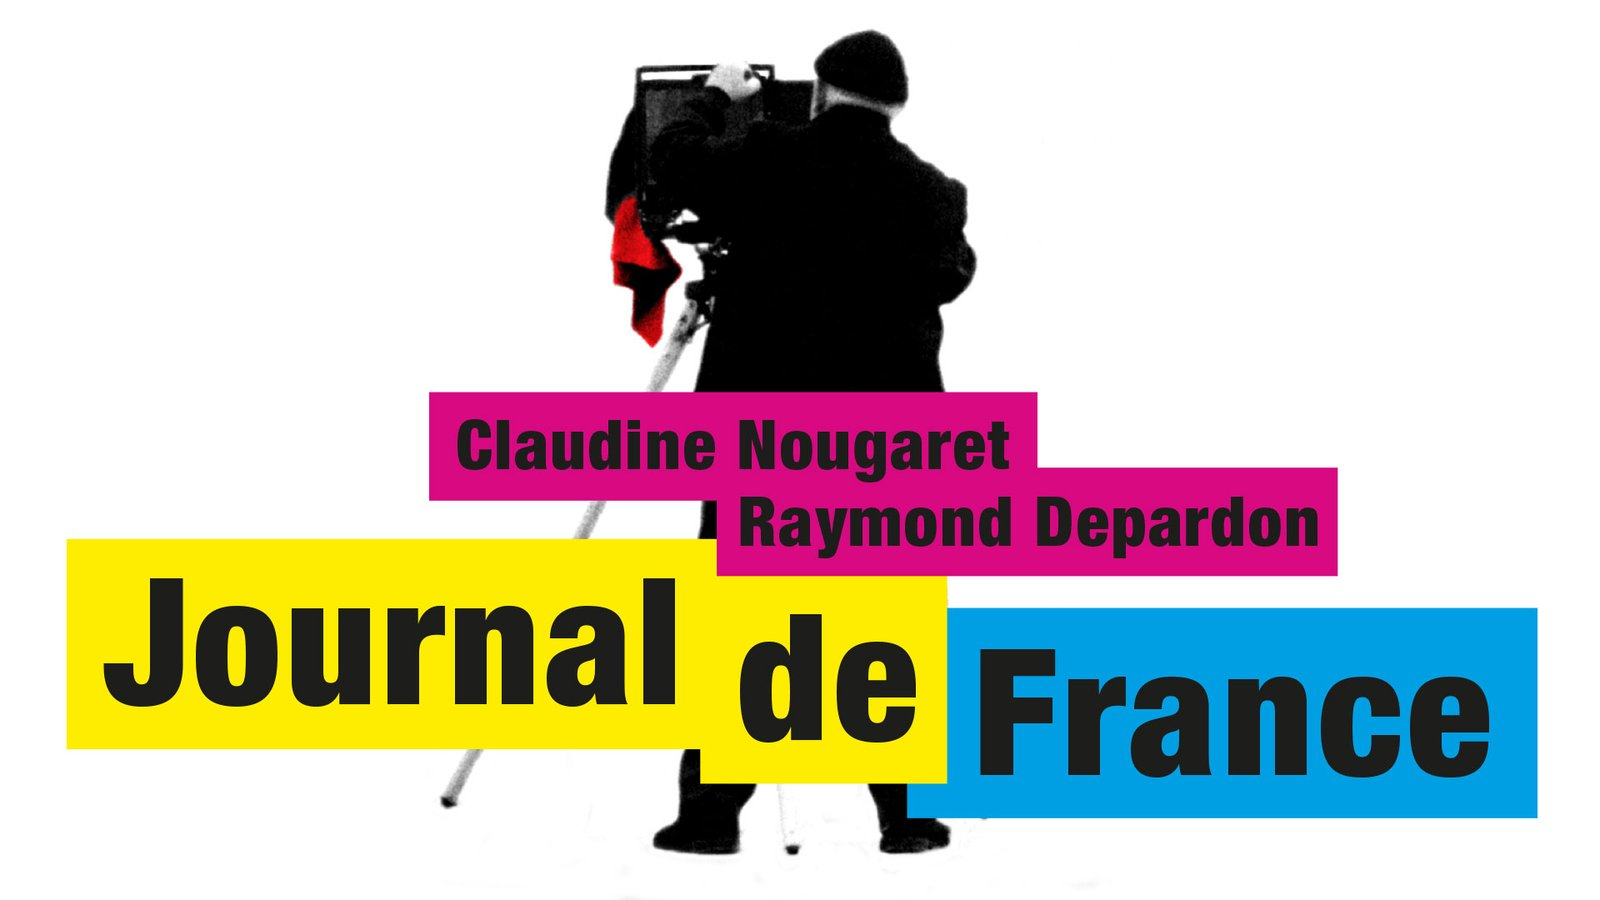 Journal de France - The Work of Renowned Photographer Raymond Depardon